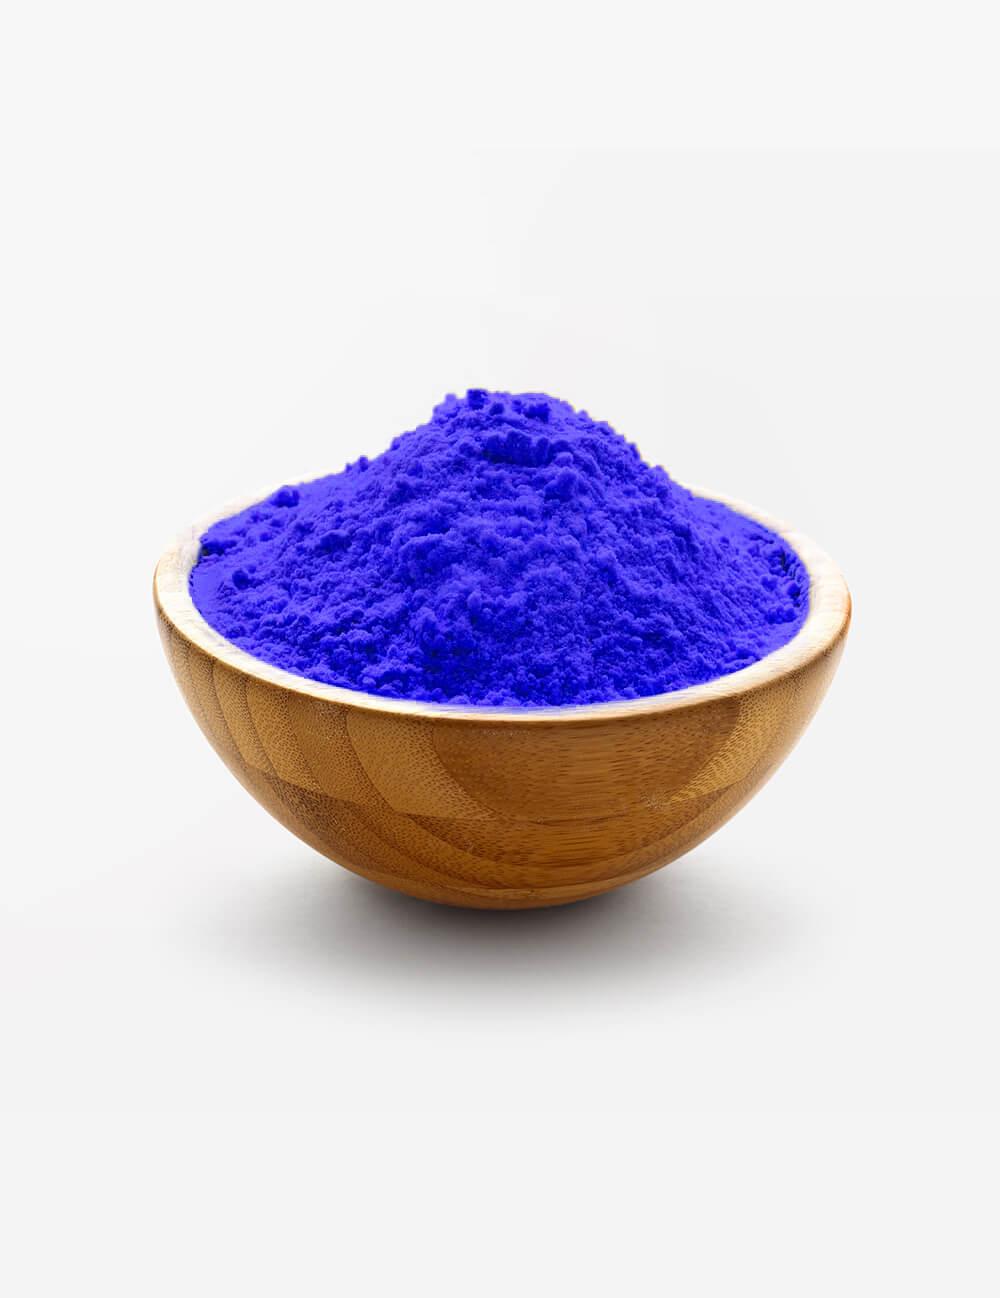 Blue Spirulina Image 4